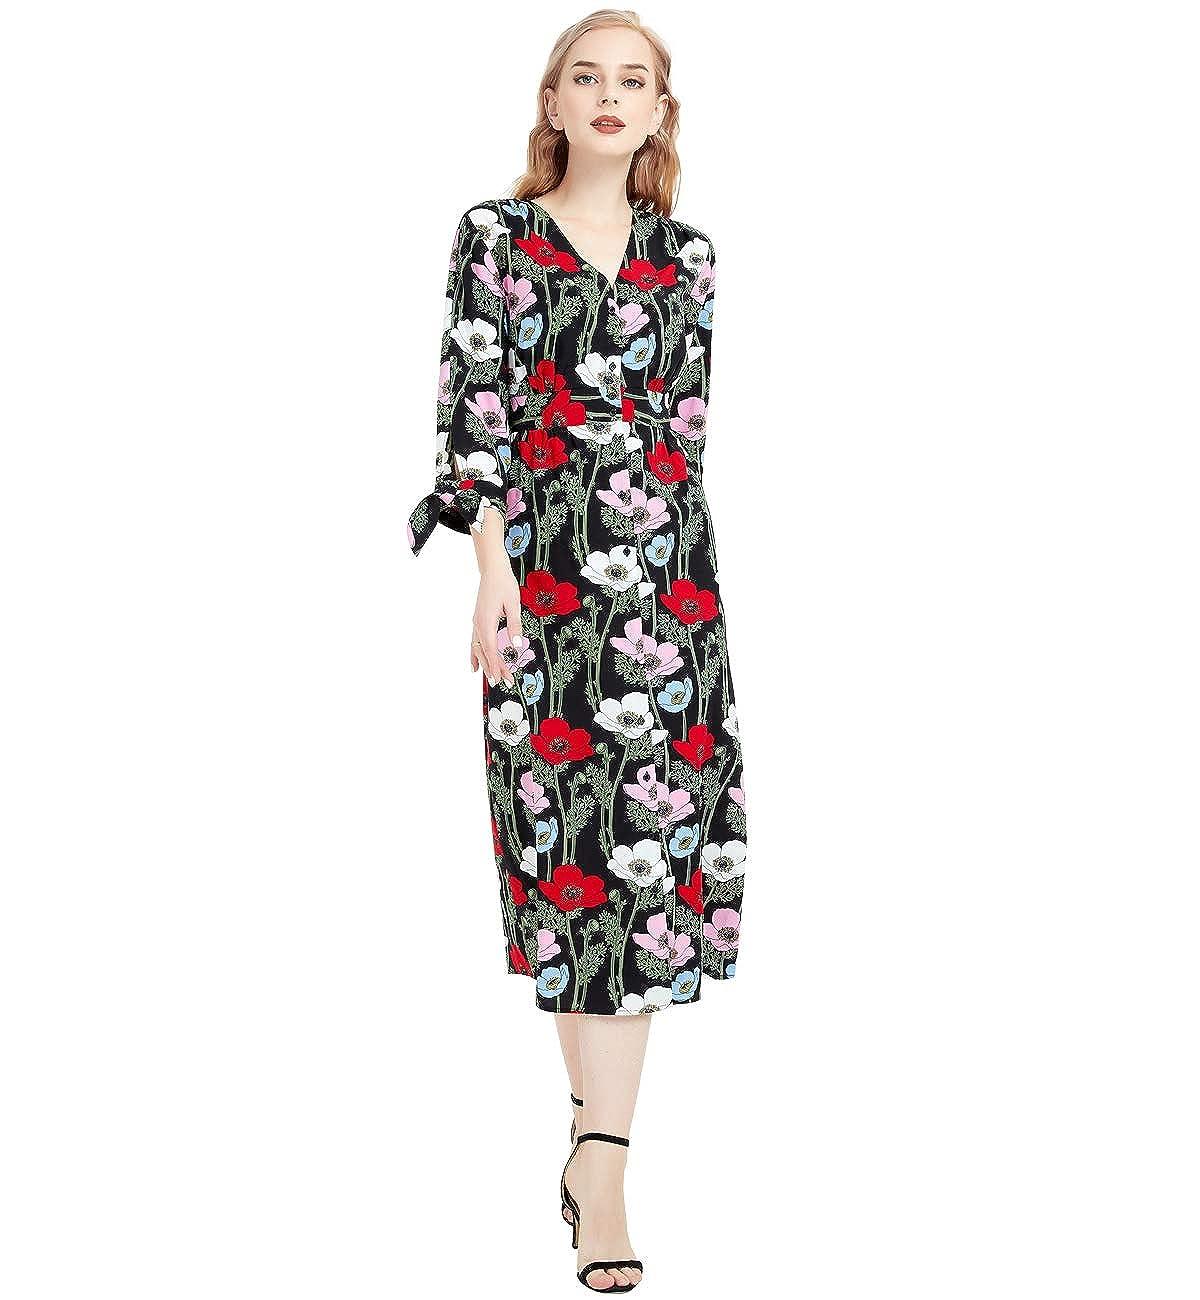 07e52dde3cb Basic Model Women s Floral Print Vintage V-Neck Boho 3 4 Sleeve Button Up Maxi  Dress at Amazon Women s Clothing store